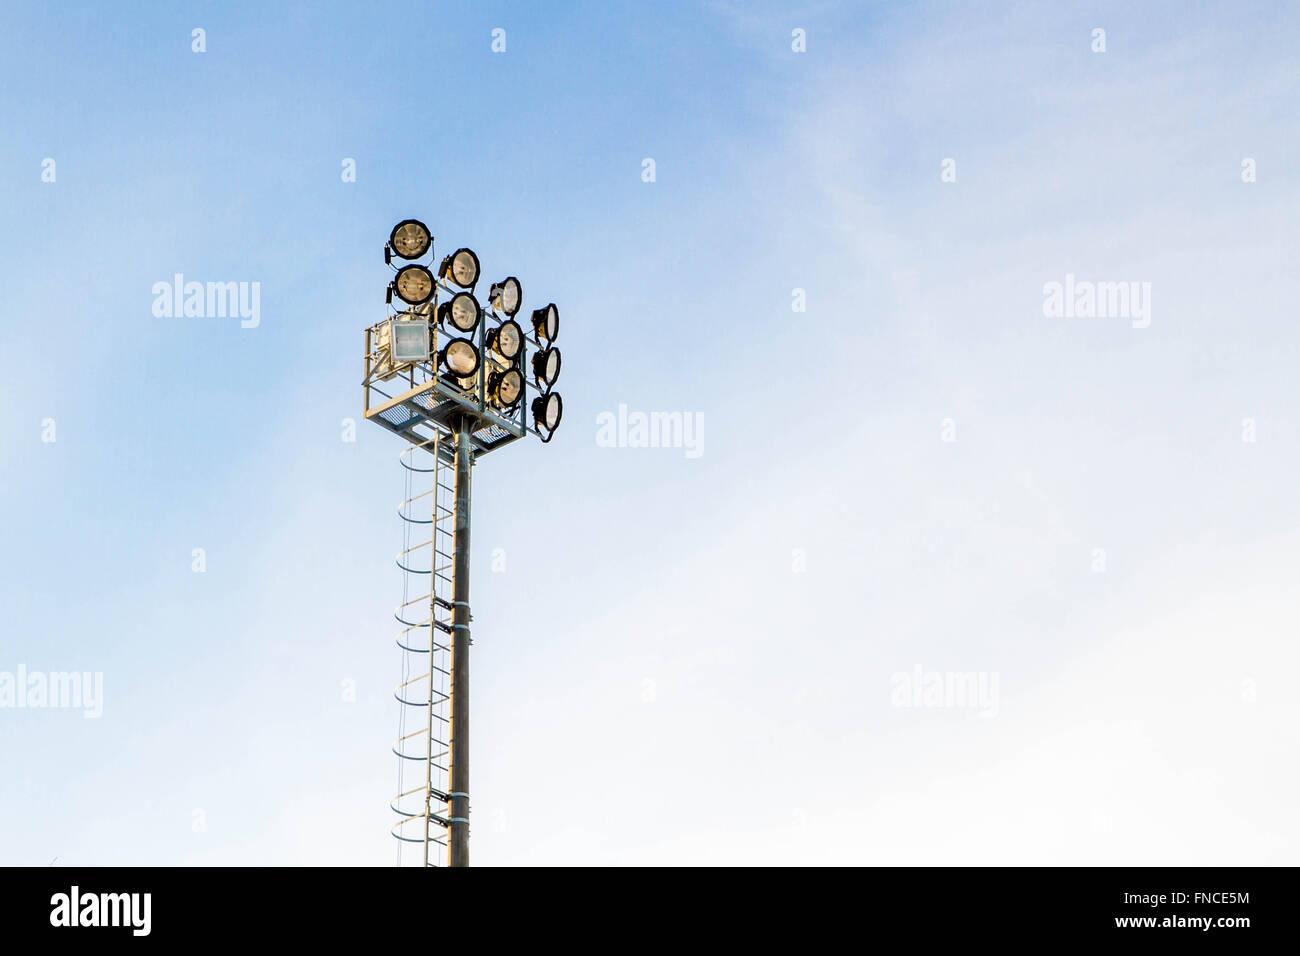 floodlights to illuminate the stadium - Stock Image